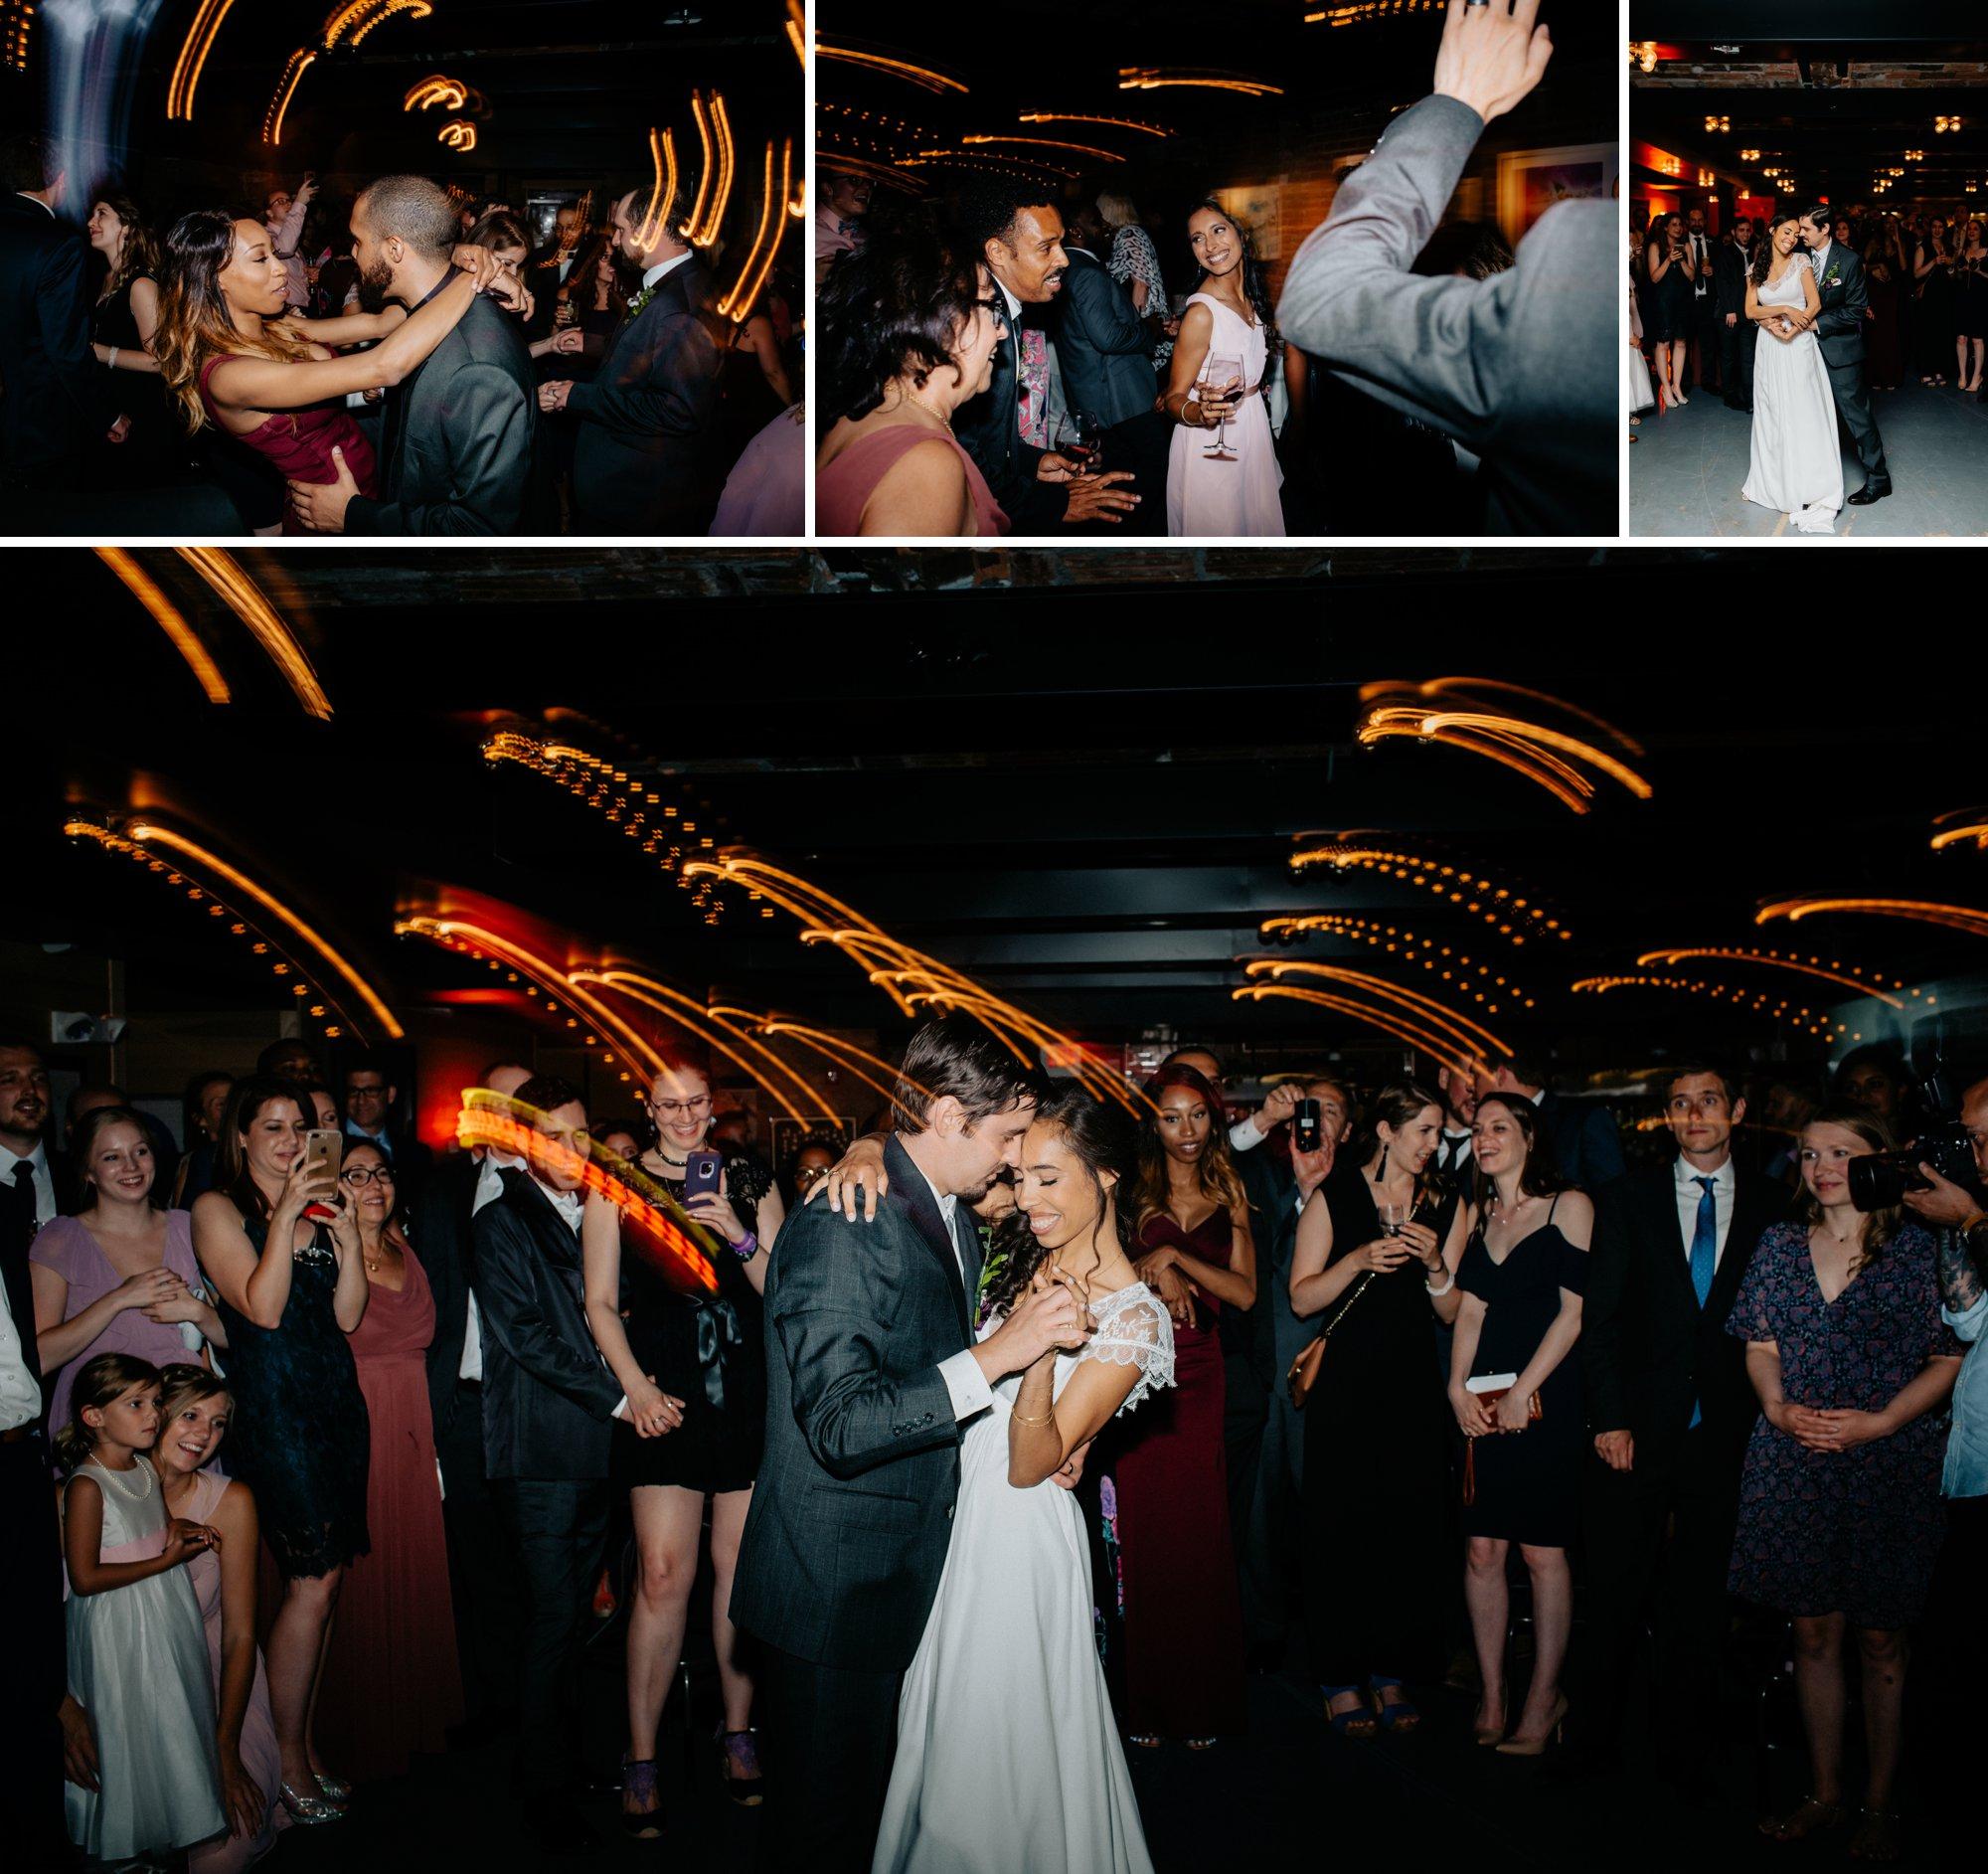 Philadelphia New Jersey Jockey Hollow Wedding Abandoned Athletic Courts Porche Jimmy Choos Dancing